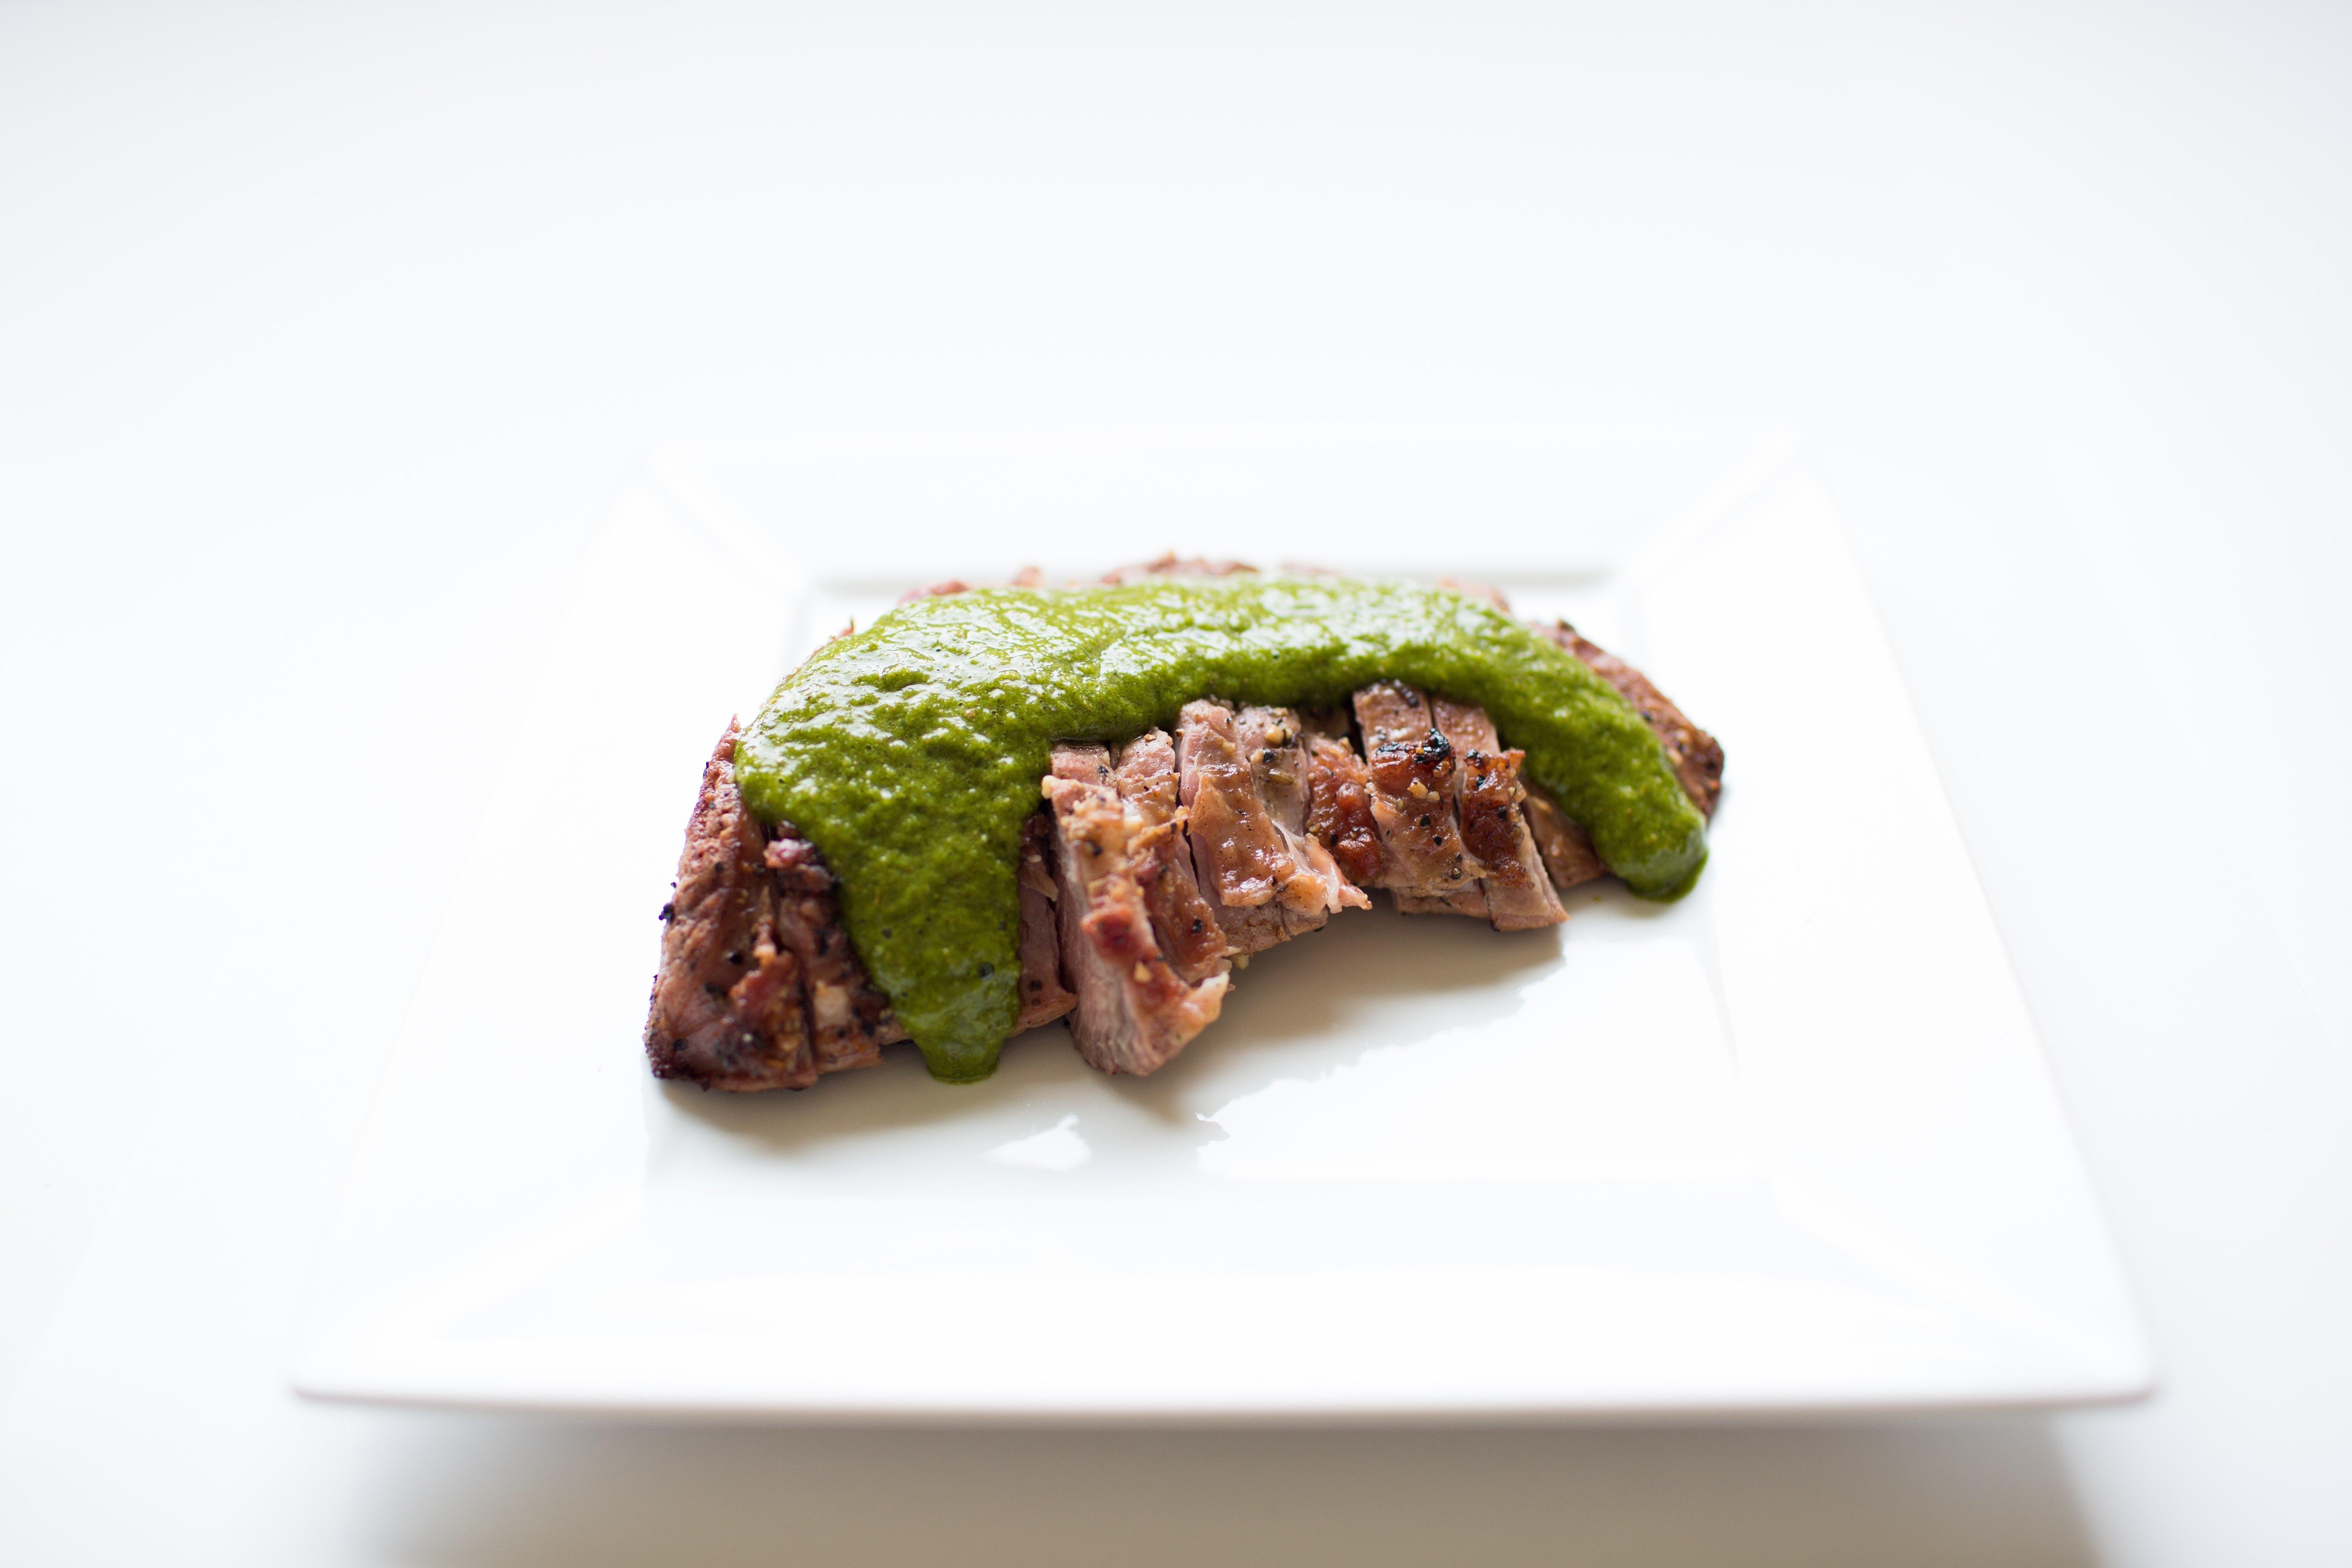 IdealFit Steak with Green Chimichurri Sauce